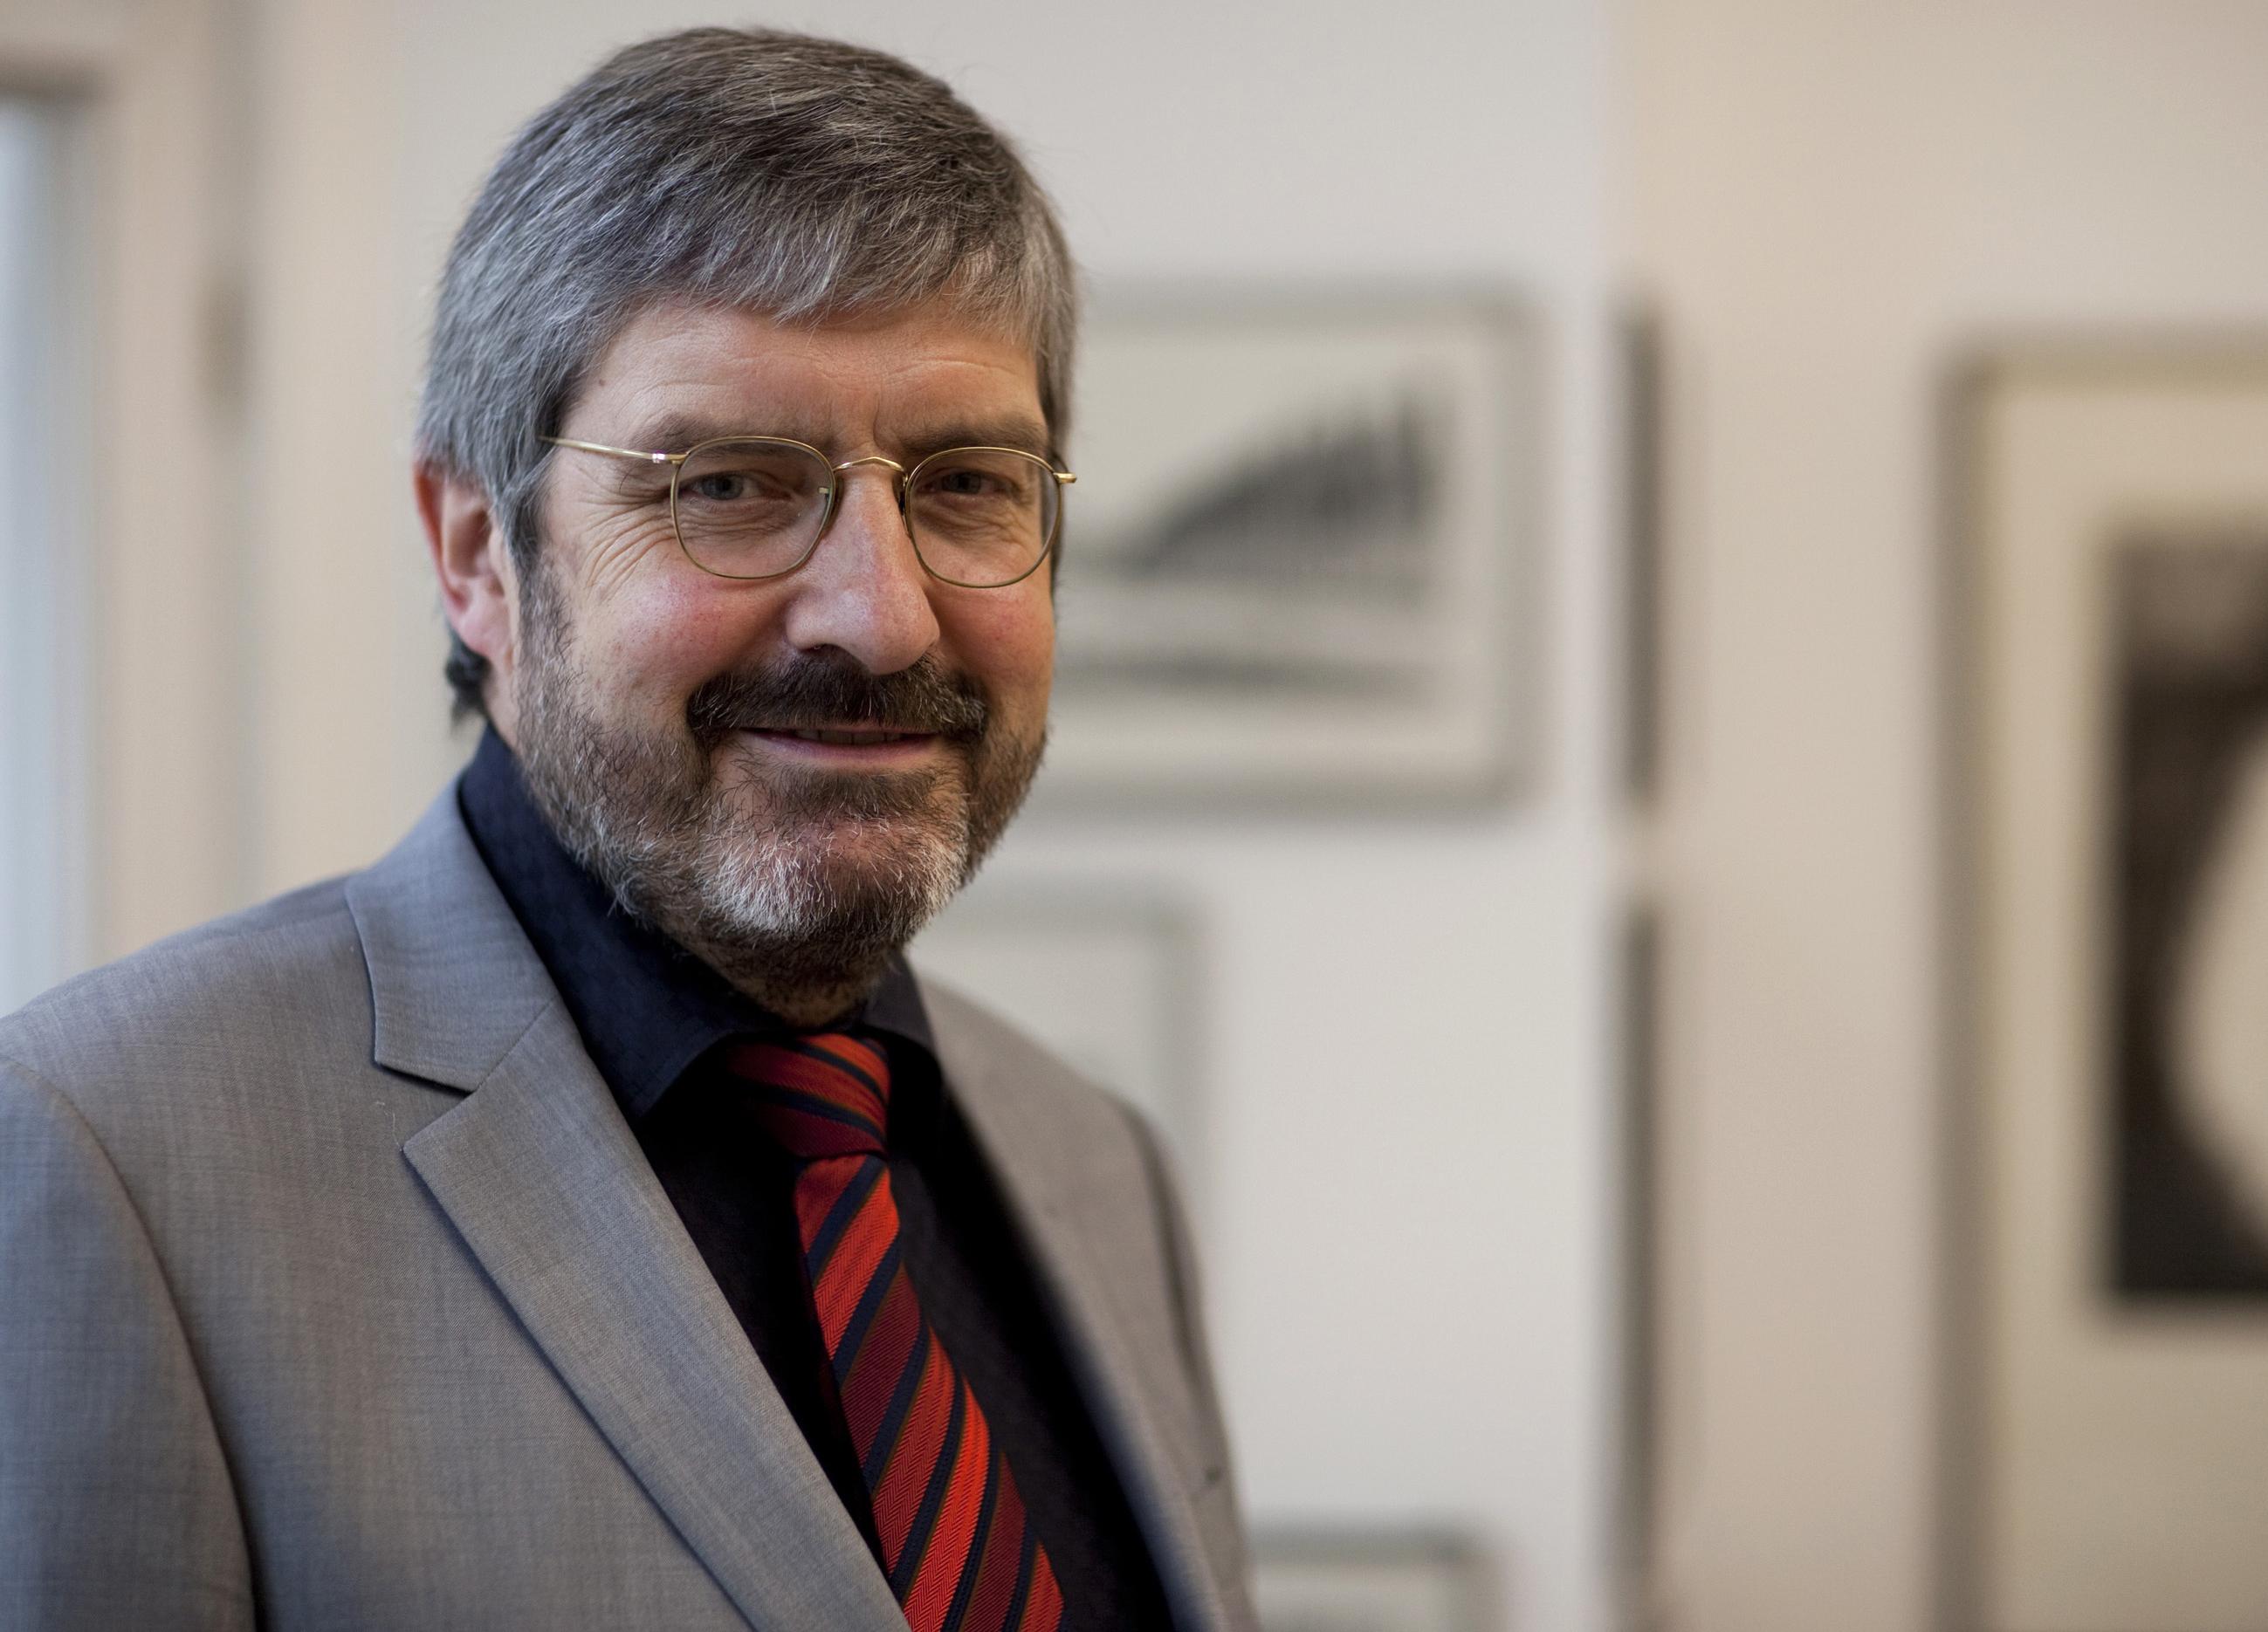 Dr. Werner Jubelius